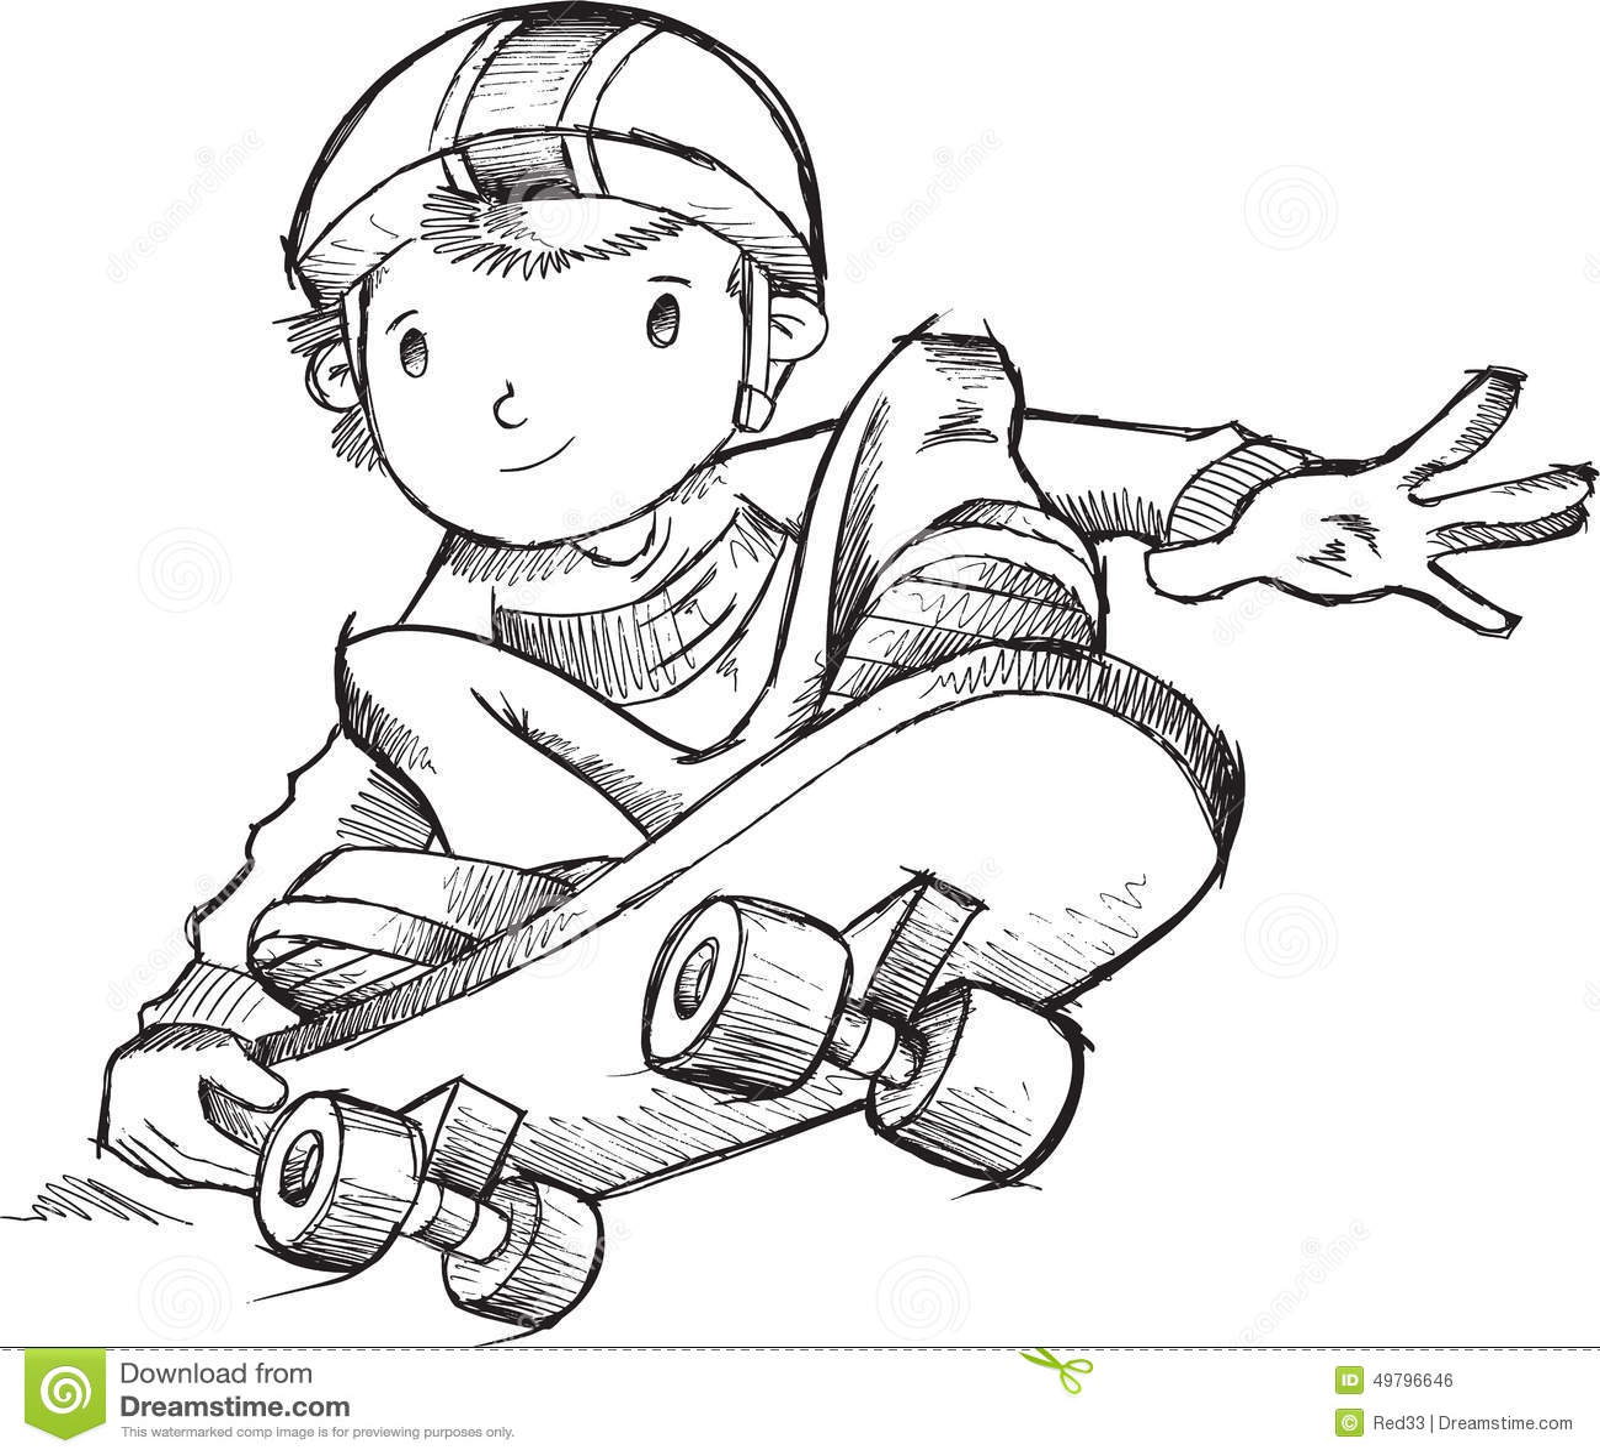 Skateboarder Doodle Vector Stock Vector